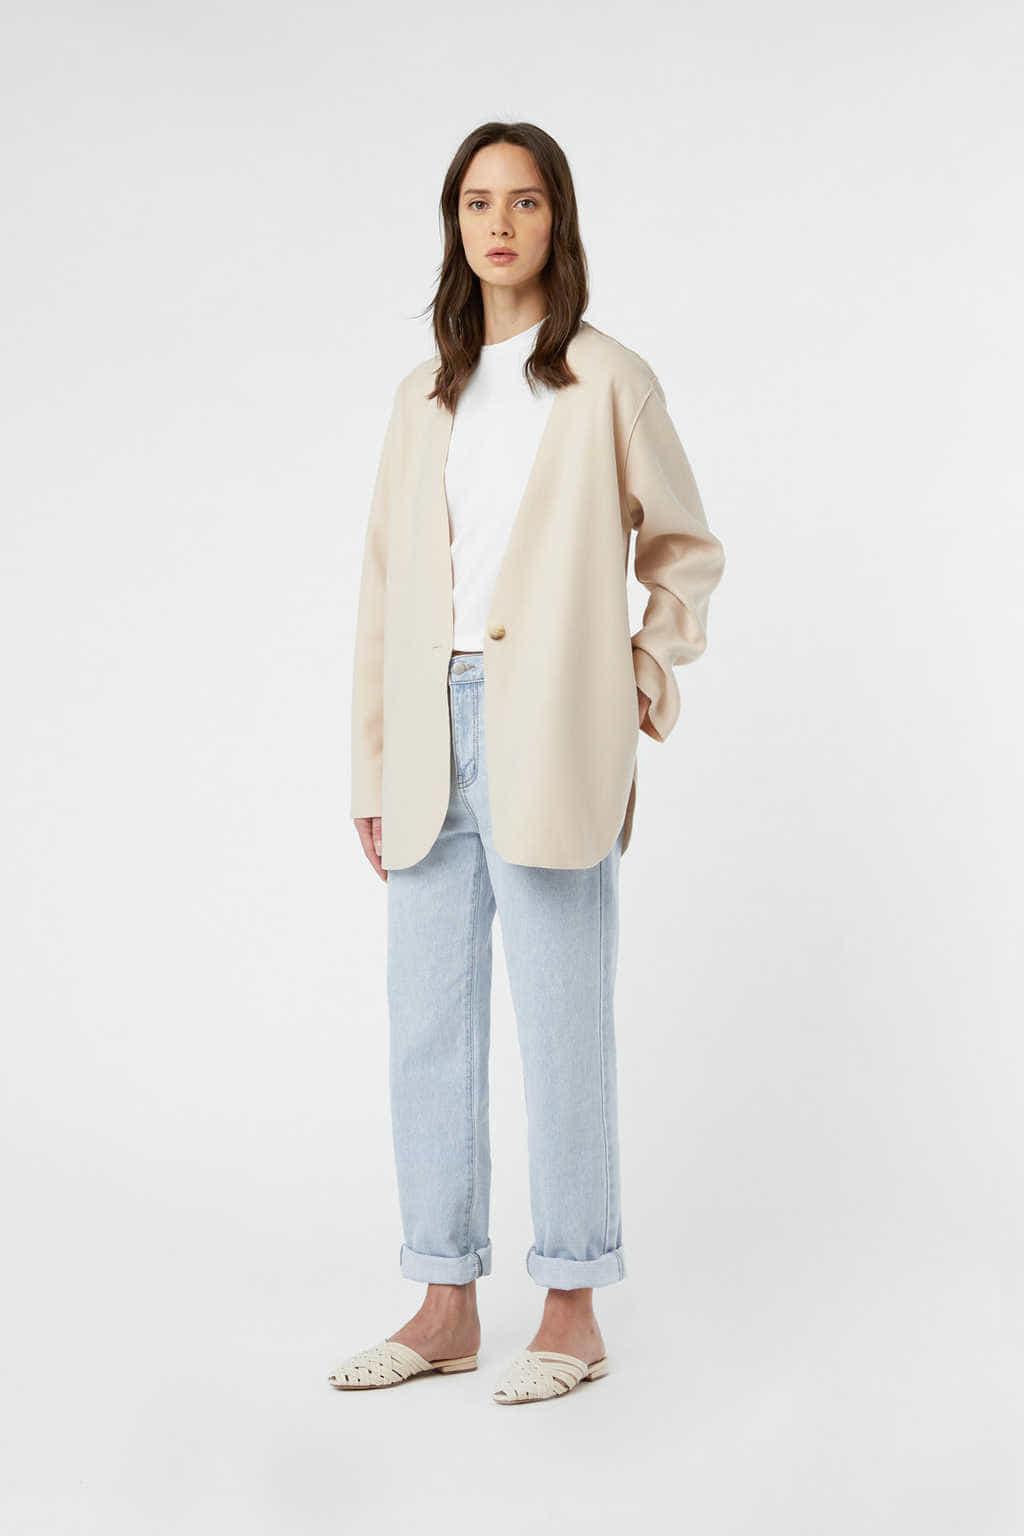 Jacket J009 Cream 1